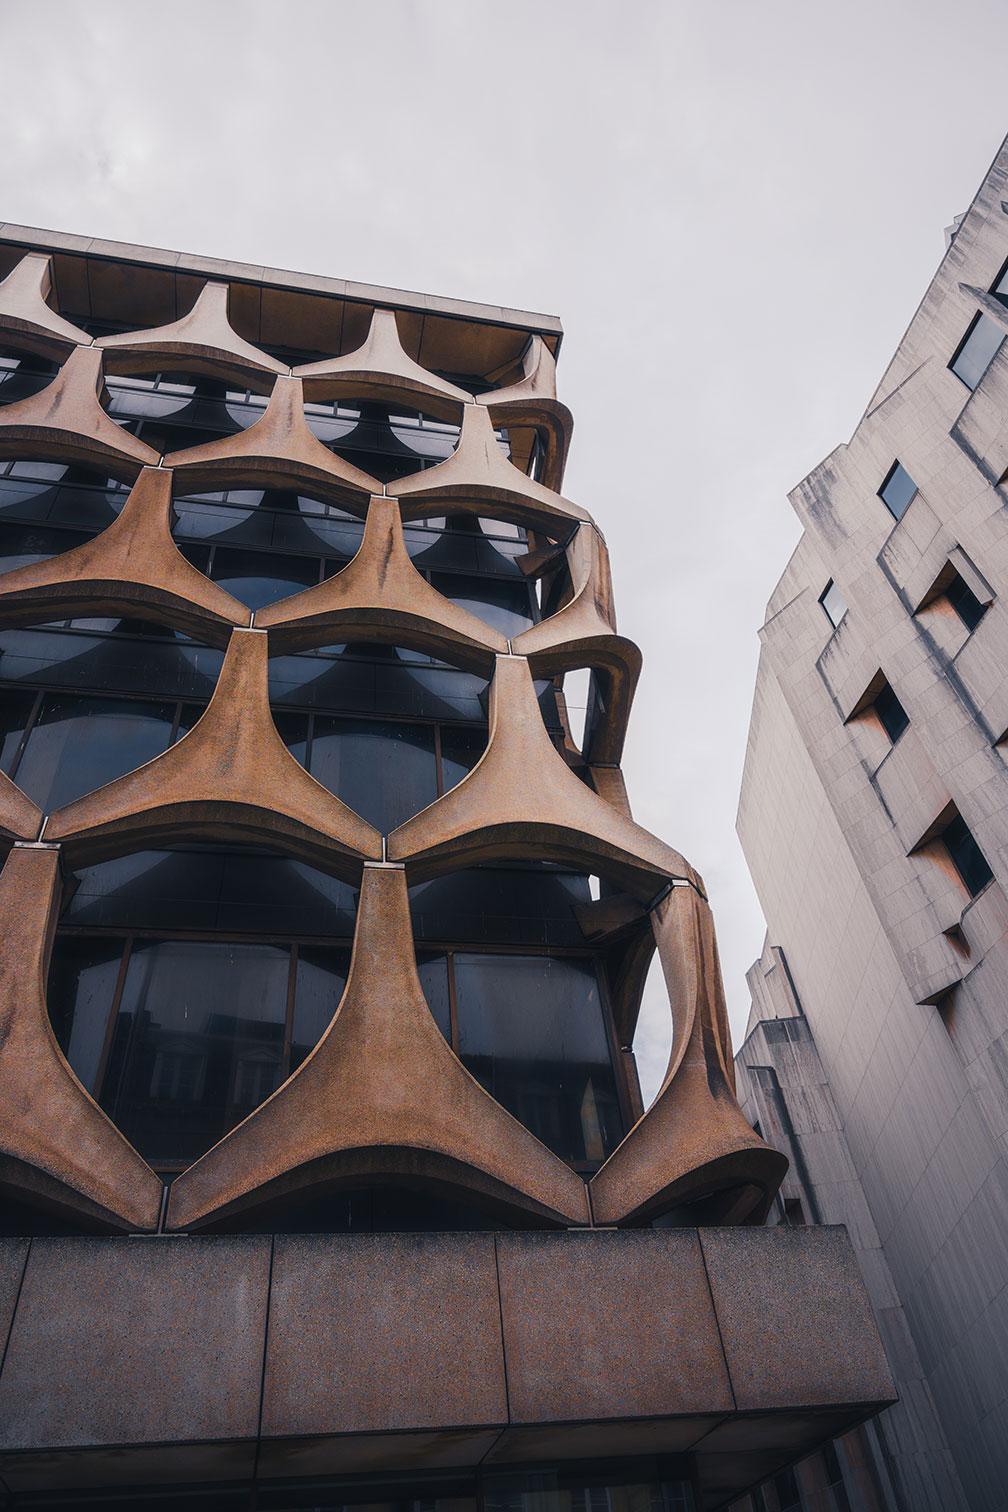 Brussel architecture building